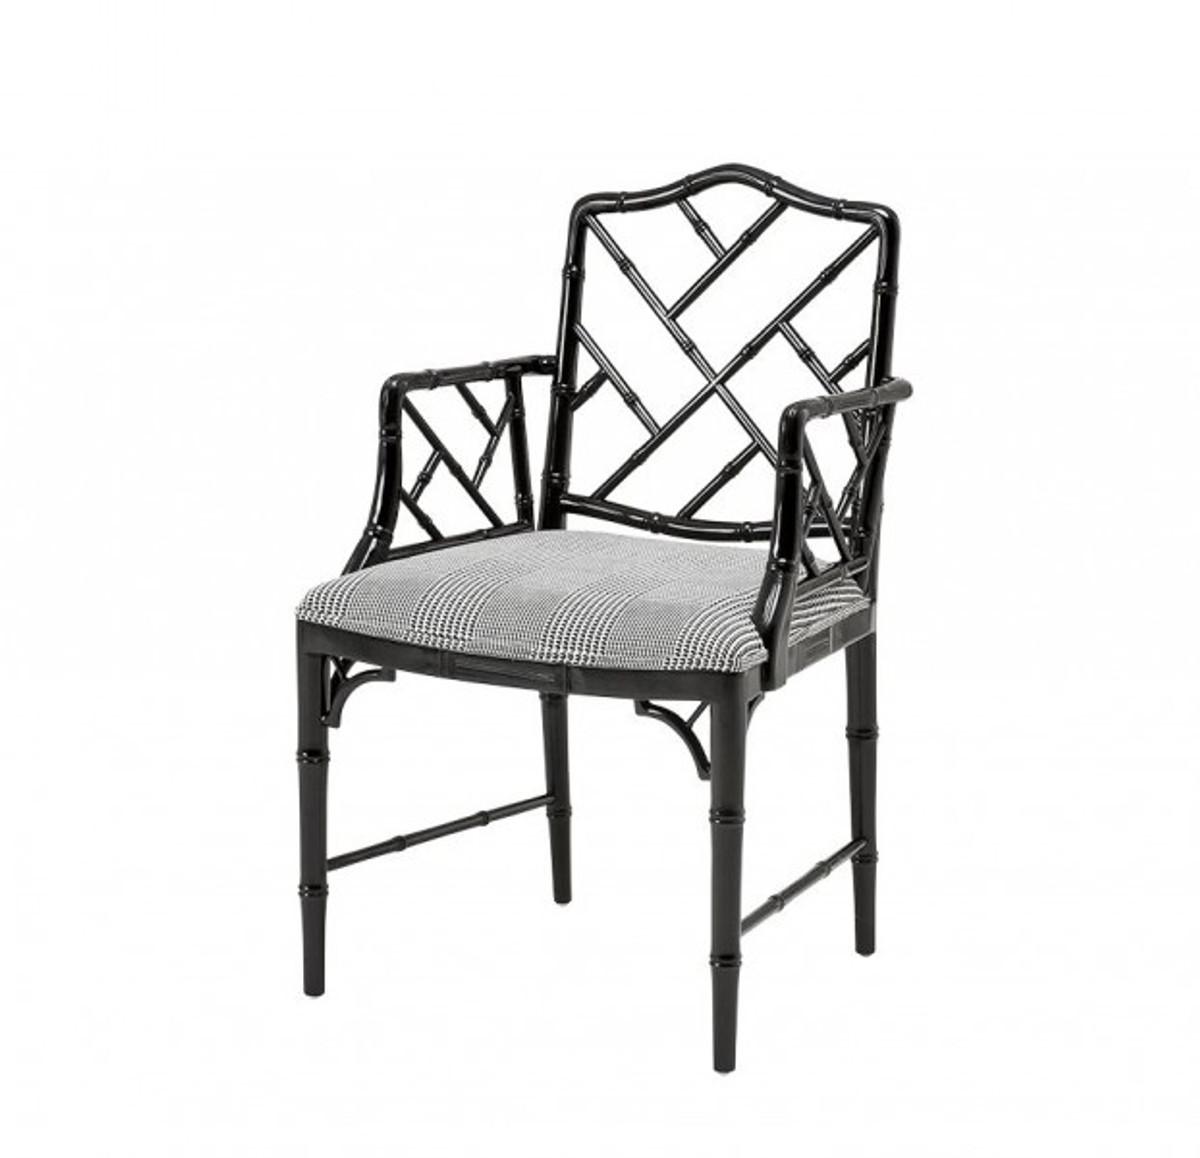 Casa padrino luxus mahagoni esszimmer stuhl mit armlehne for Stuhl mit armlehne schwarz